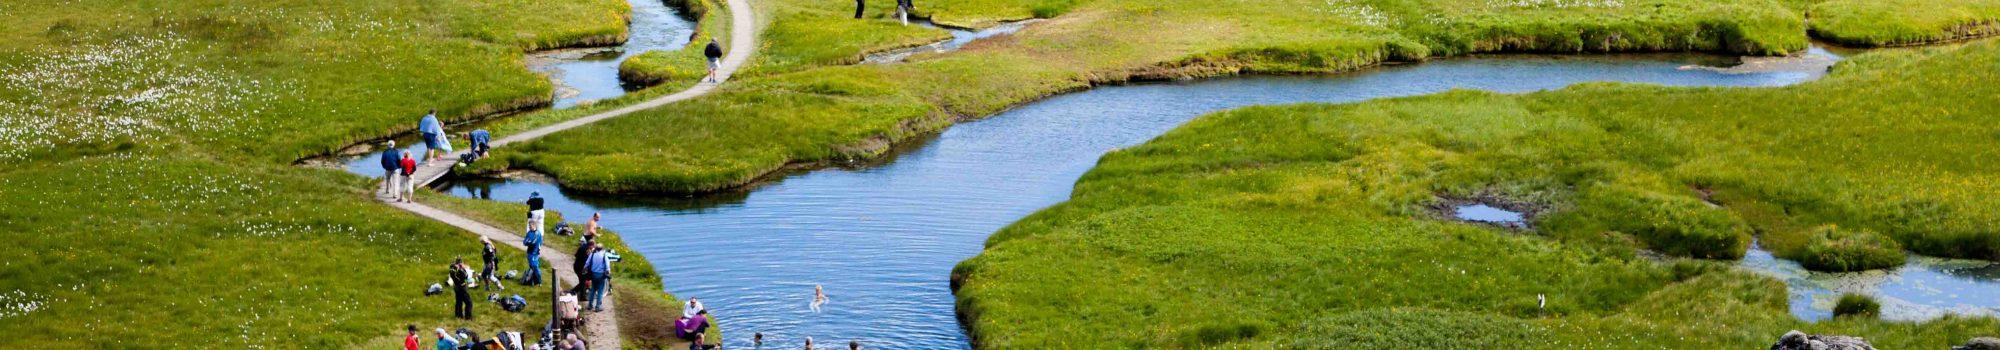 Landmannalaugar-bathing-hotspring-Iceland1